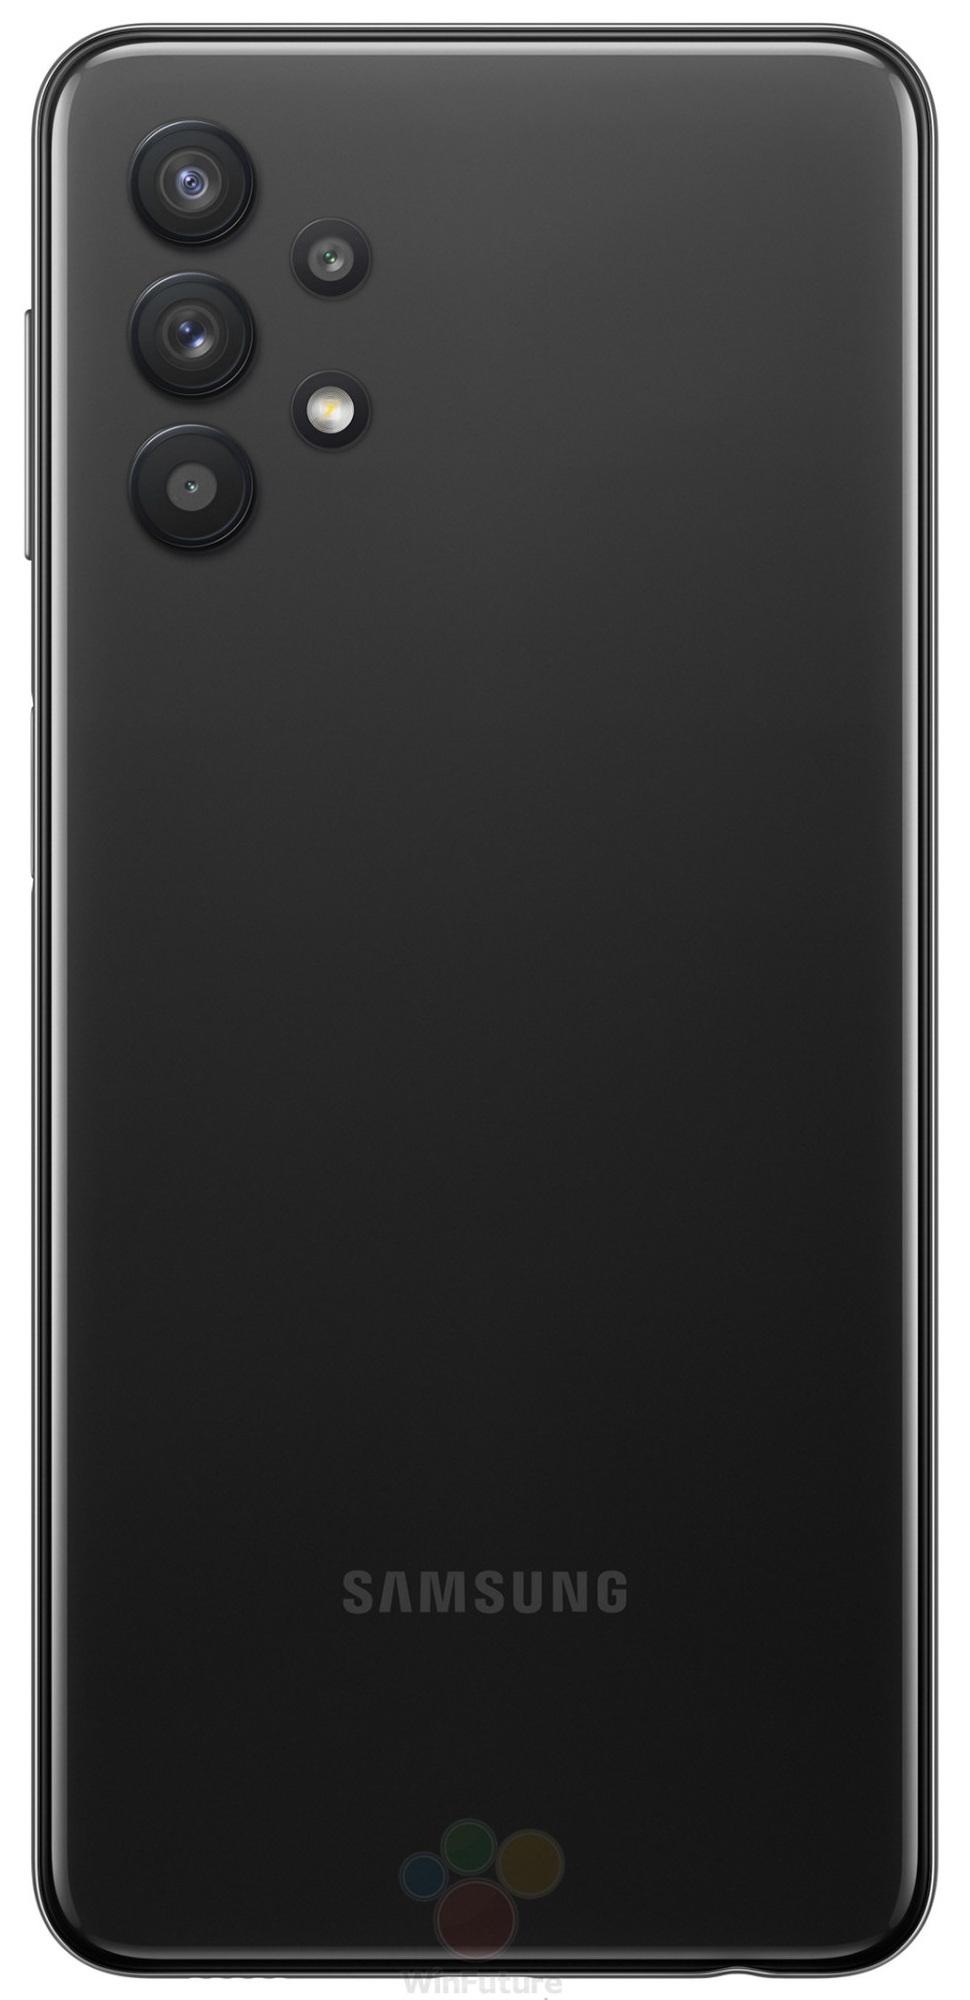 Samsung Galaxy A32: самый доступный смартфон от Samsung с 5G. Фото Samsung  - galaxy_a32_samyj_dostupnyj_samsung_s_5g_bez_bloka_pod_kameru_na_foto_6